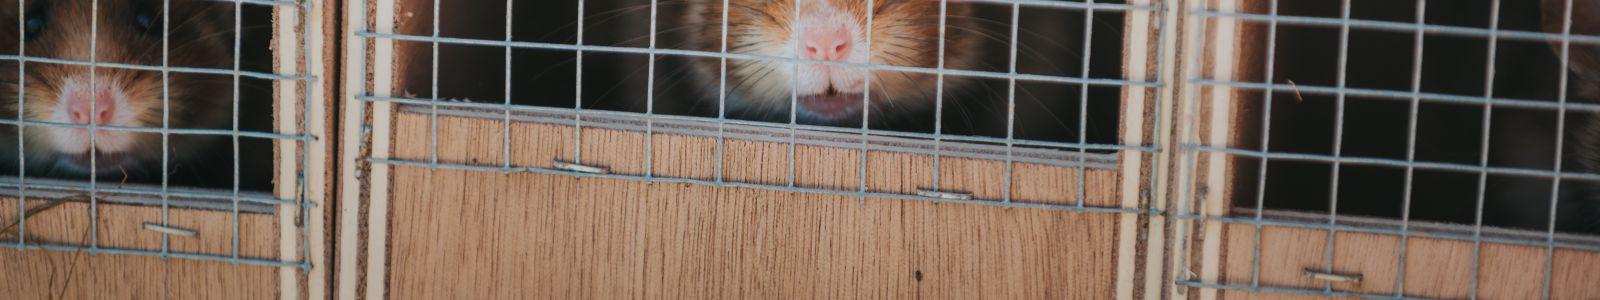 Préservation du hamster d'Alsace